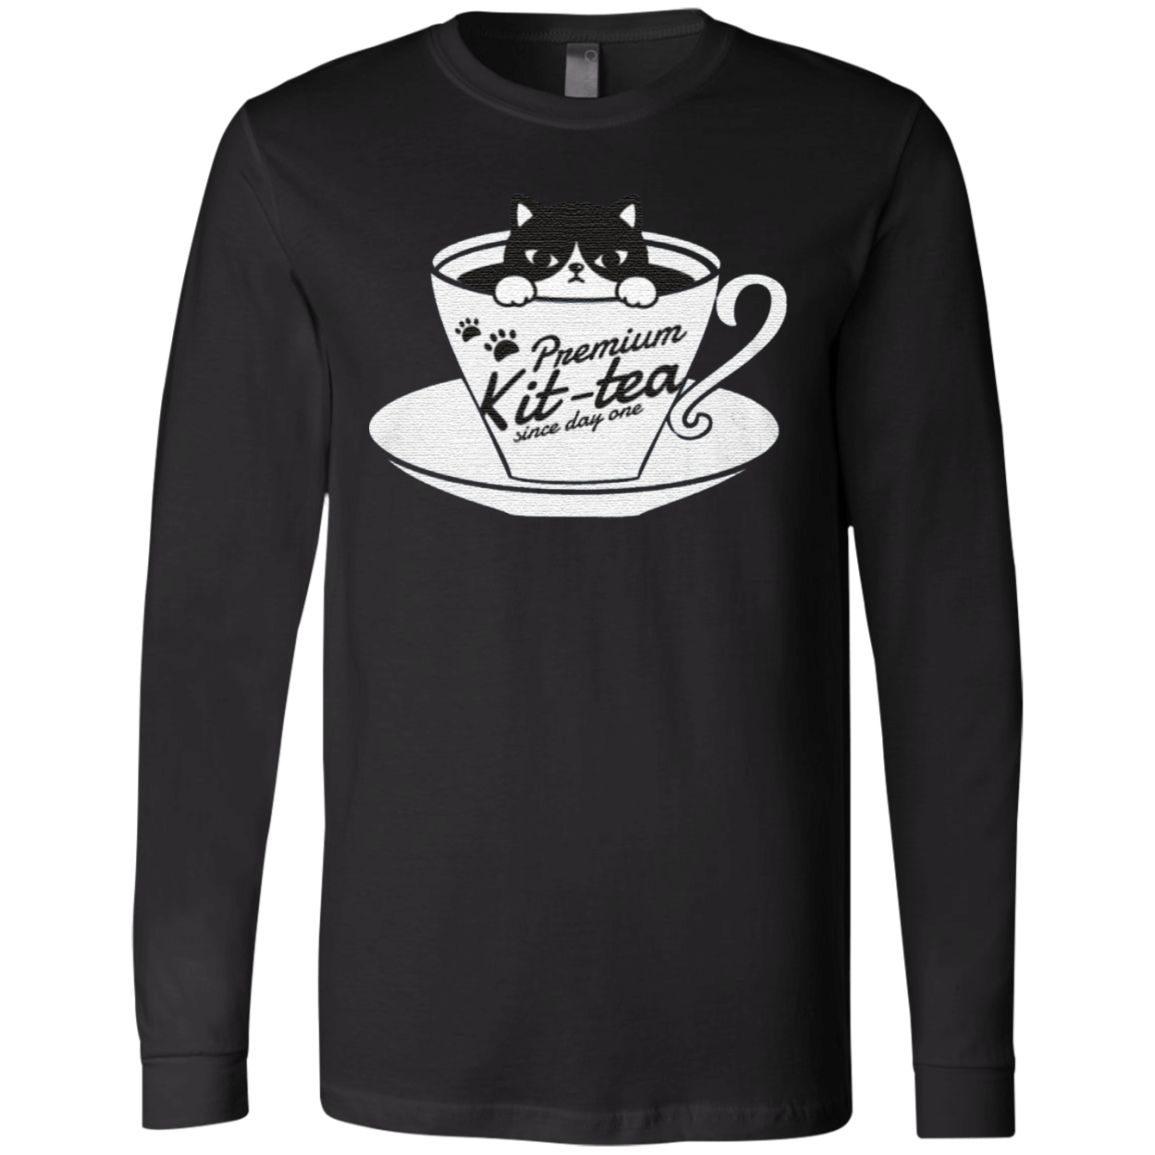 Premium Kit-tea Since Day Funny TShirt